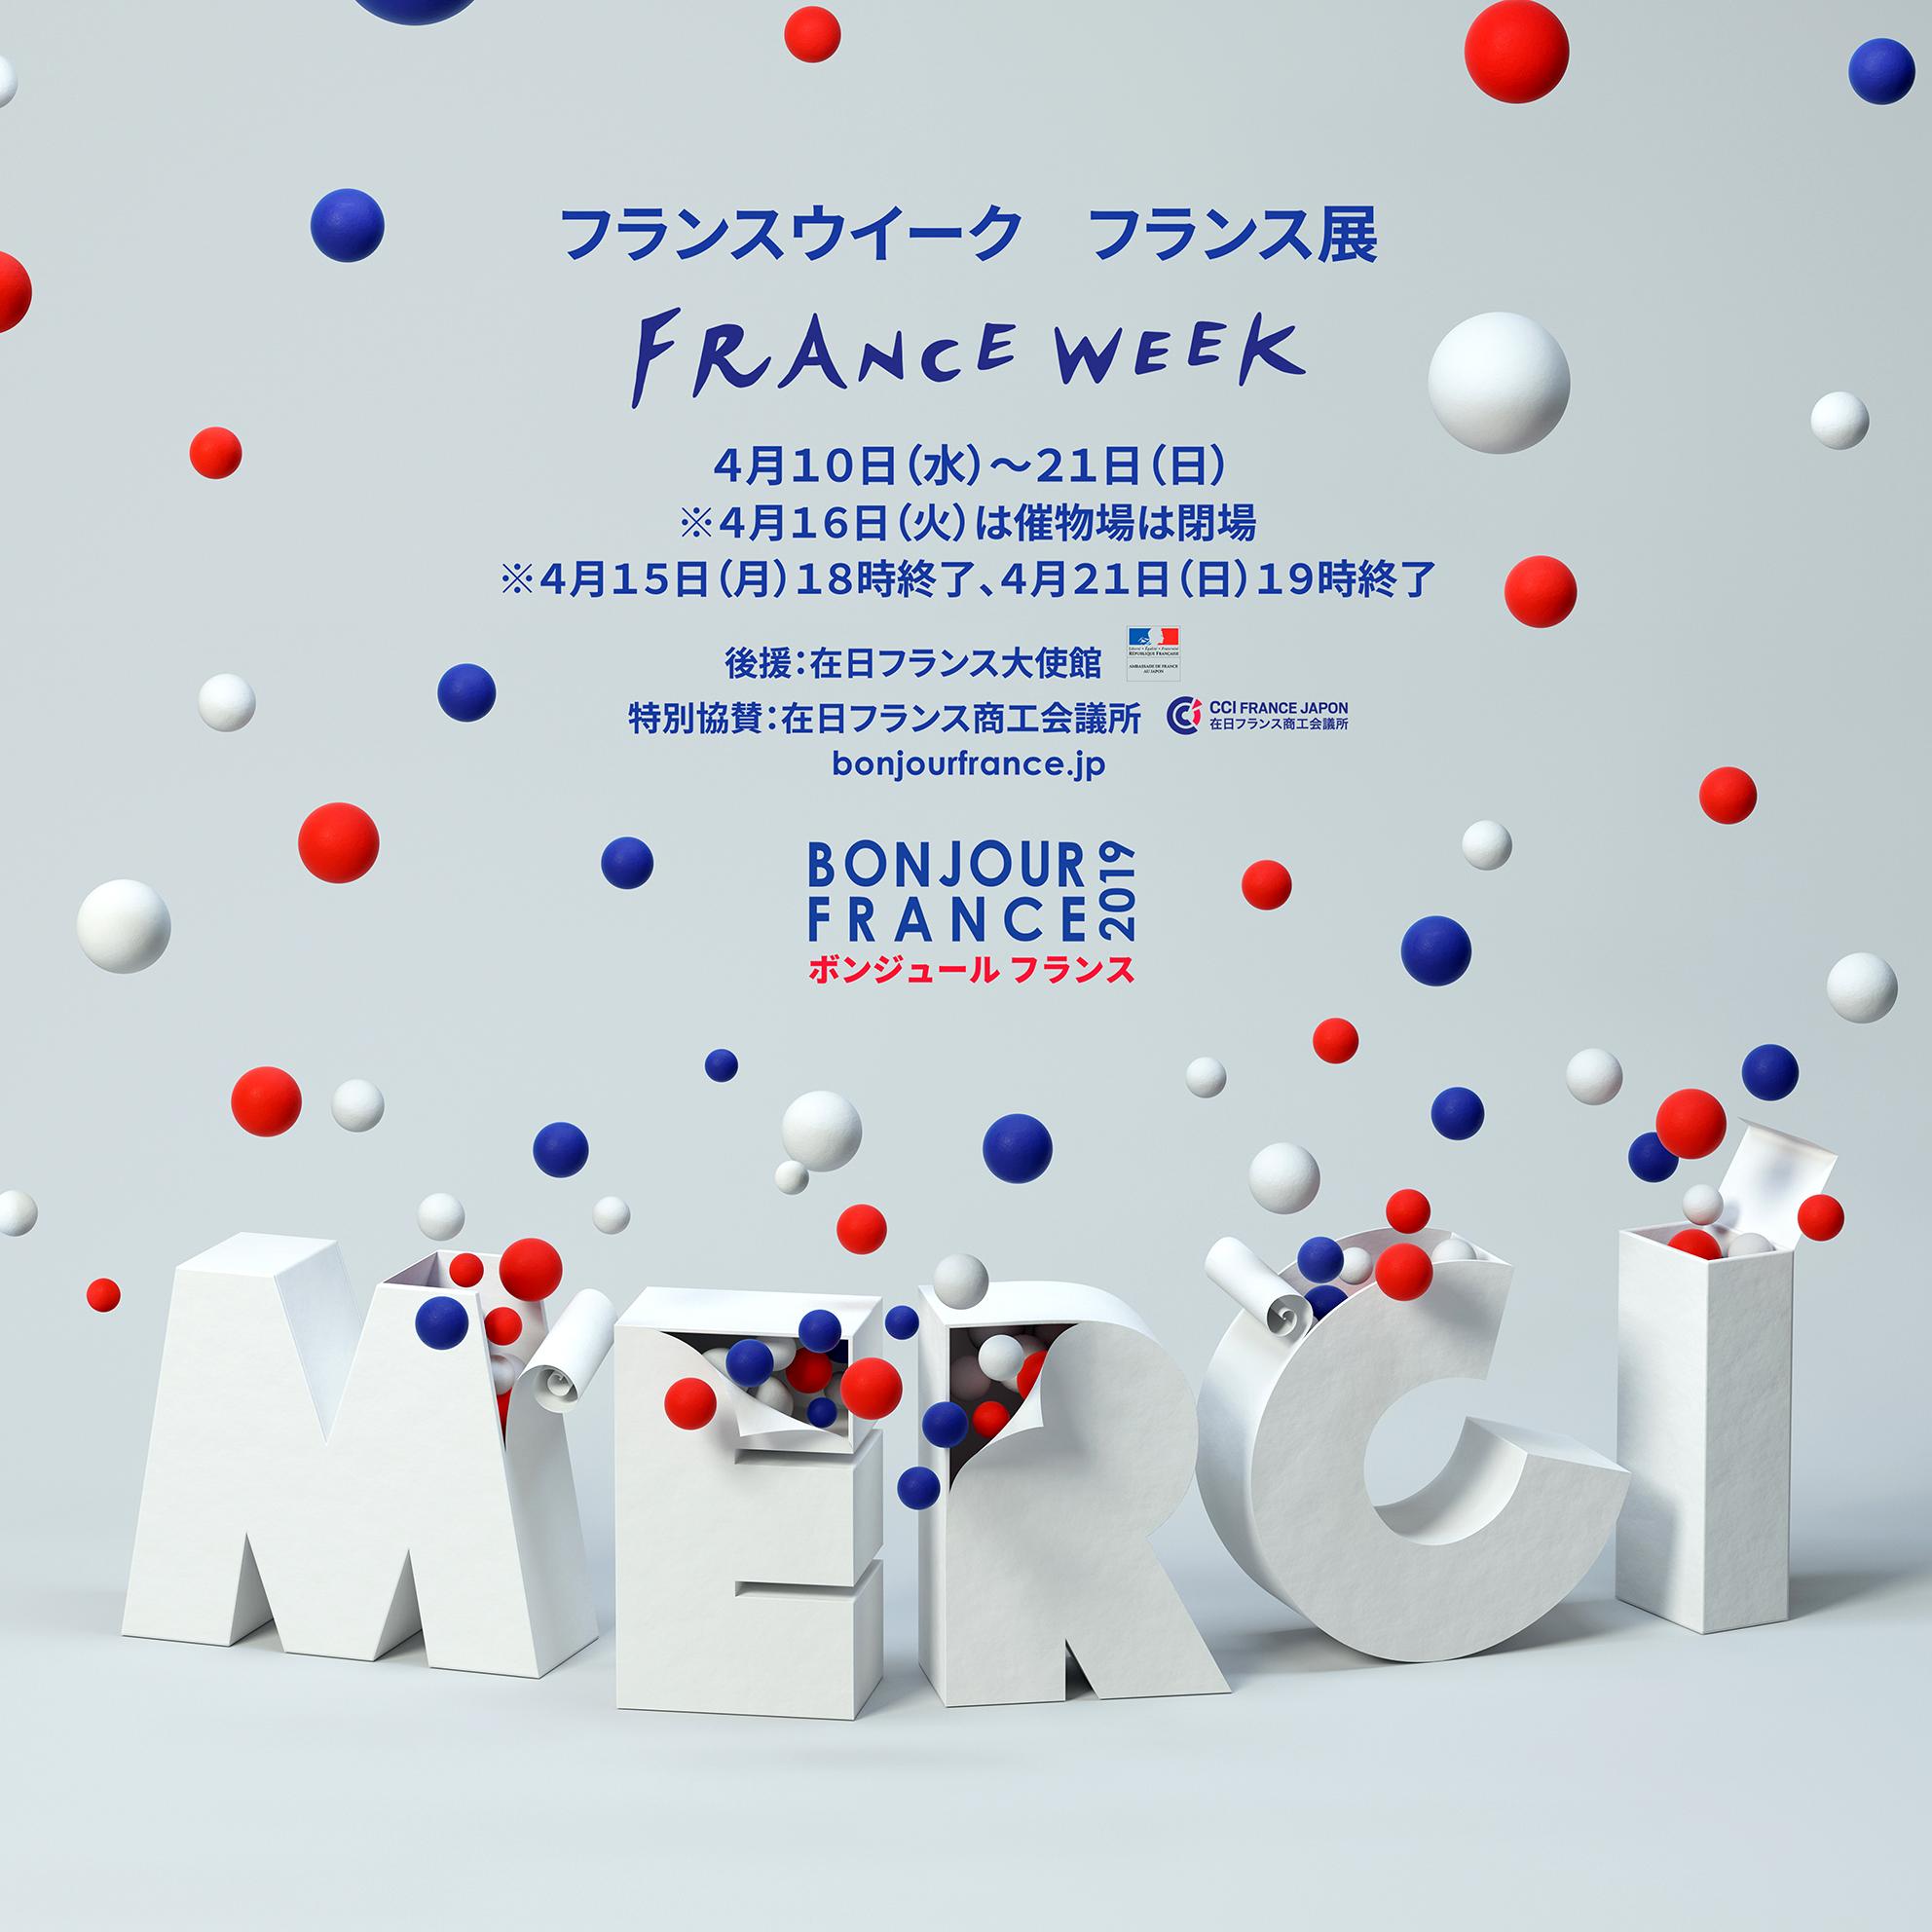 Bonjour France 2019